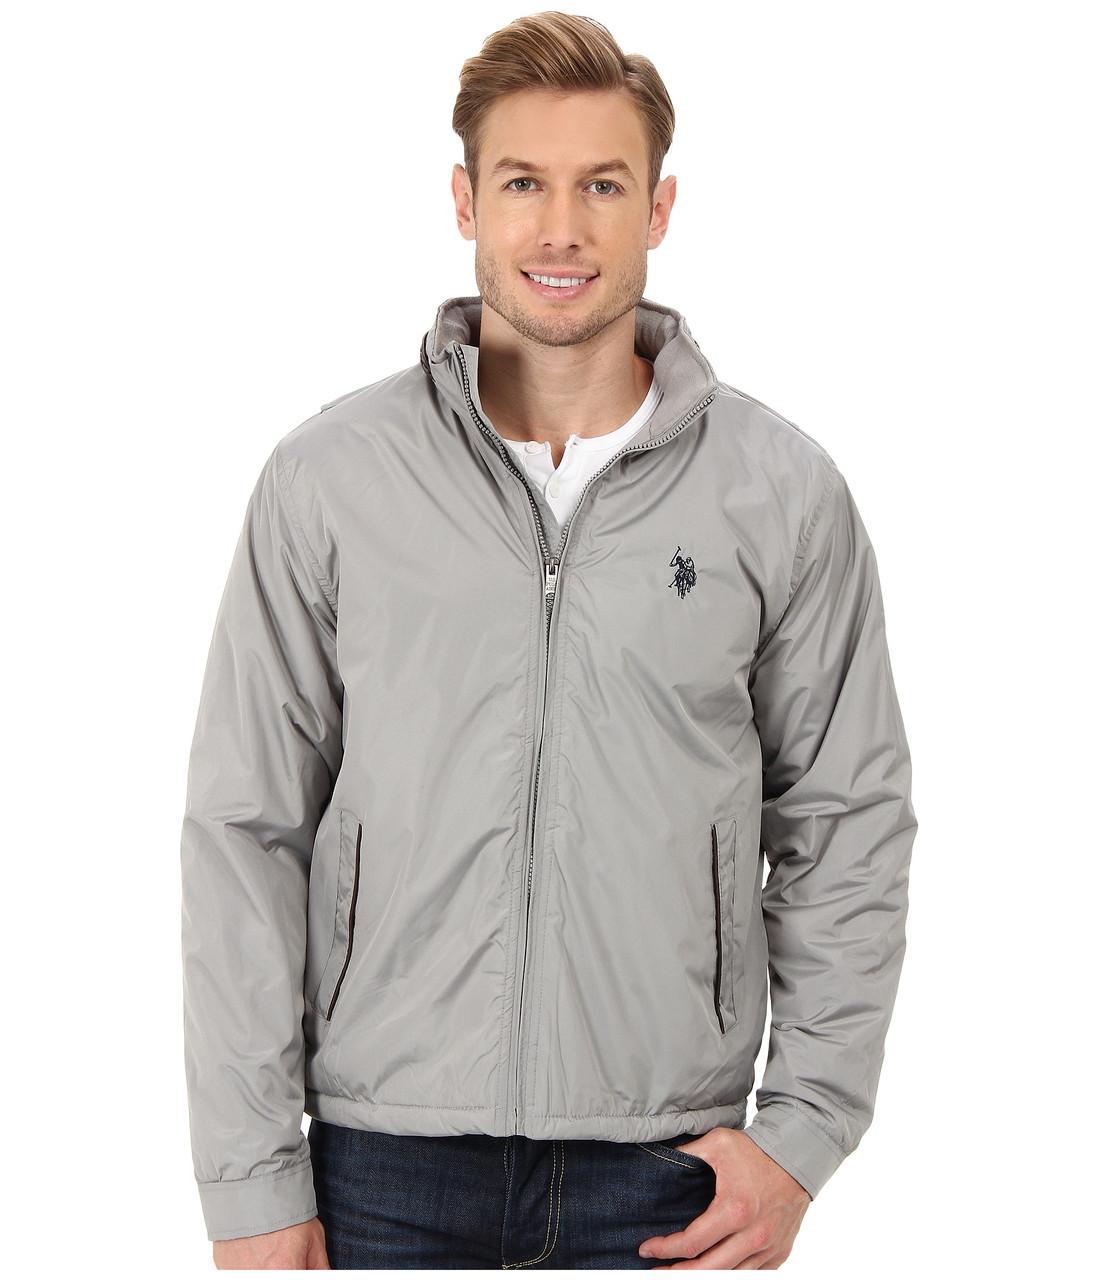 Куртка U.S. Polo Assn., XL, Lime Stone, 105352Q8-LMST